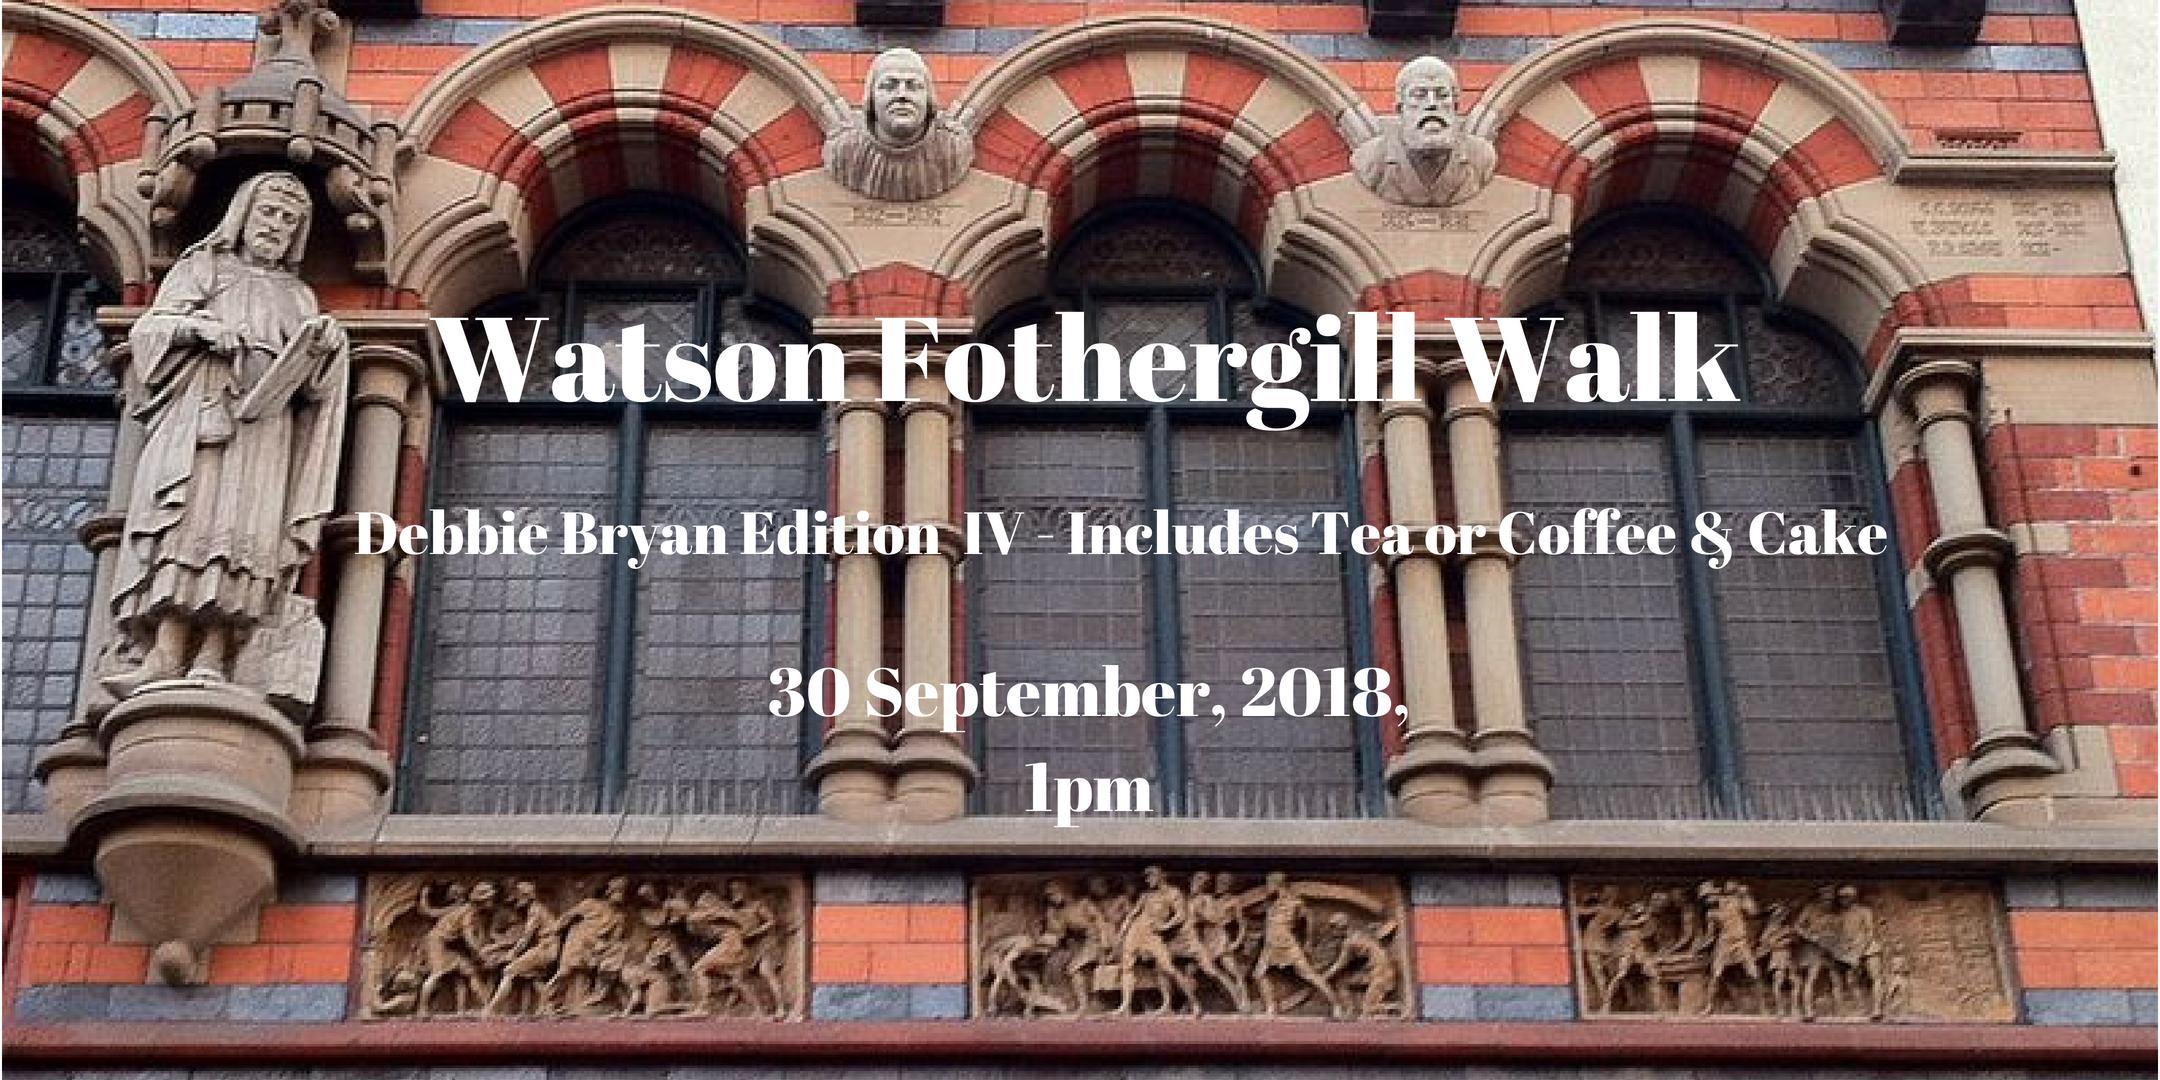 iv sep 30 Watson Fothergill Walk